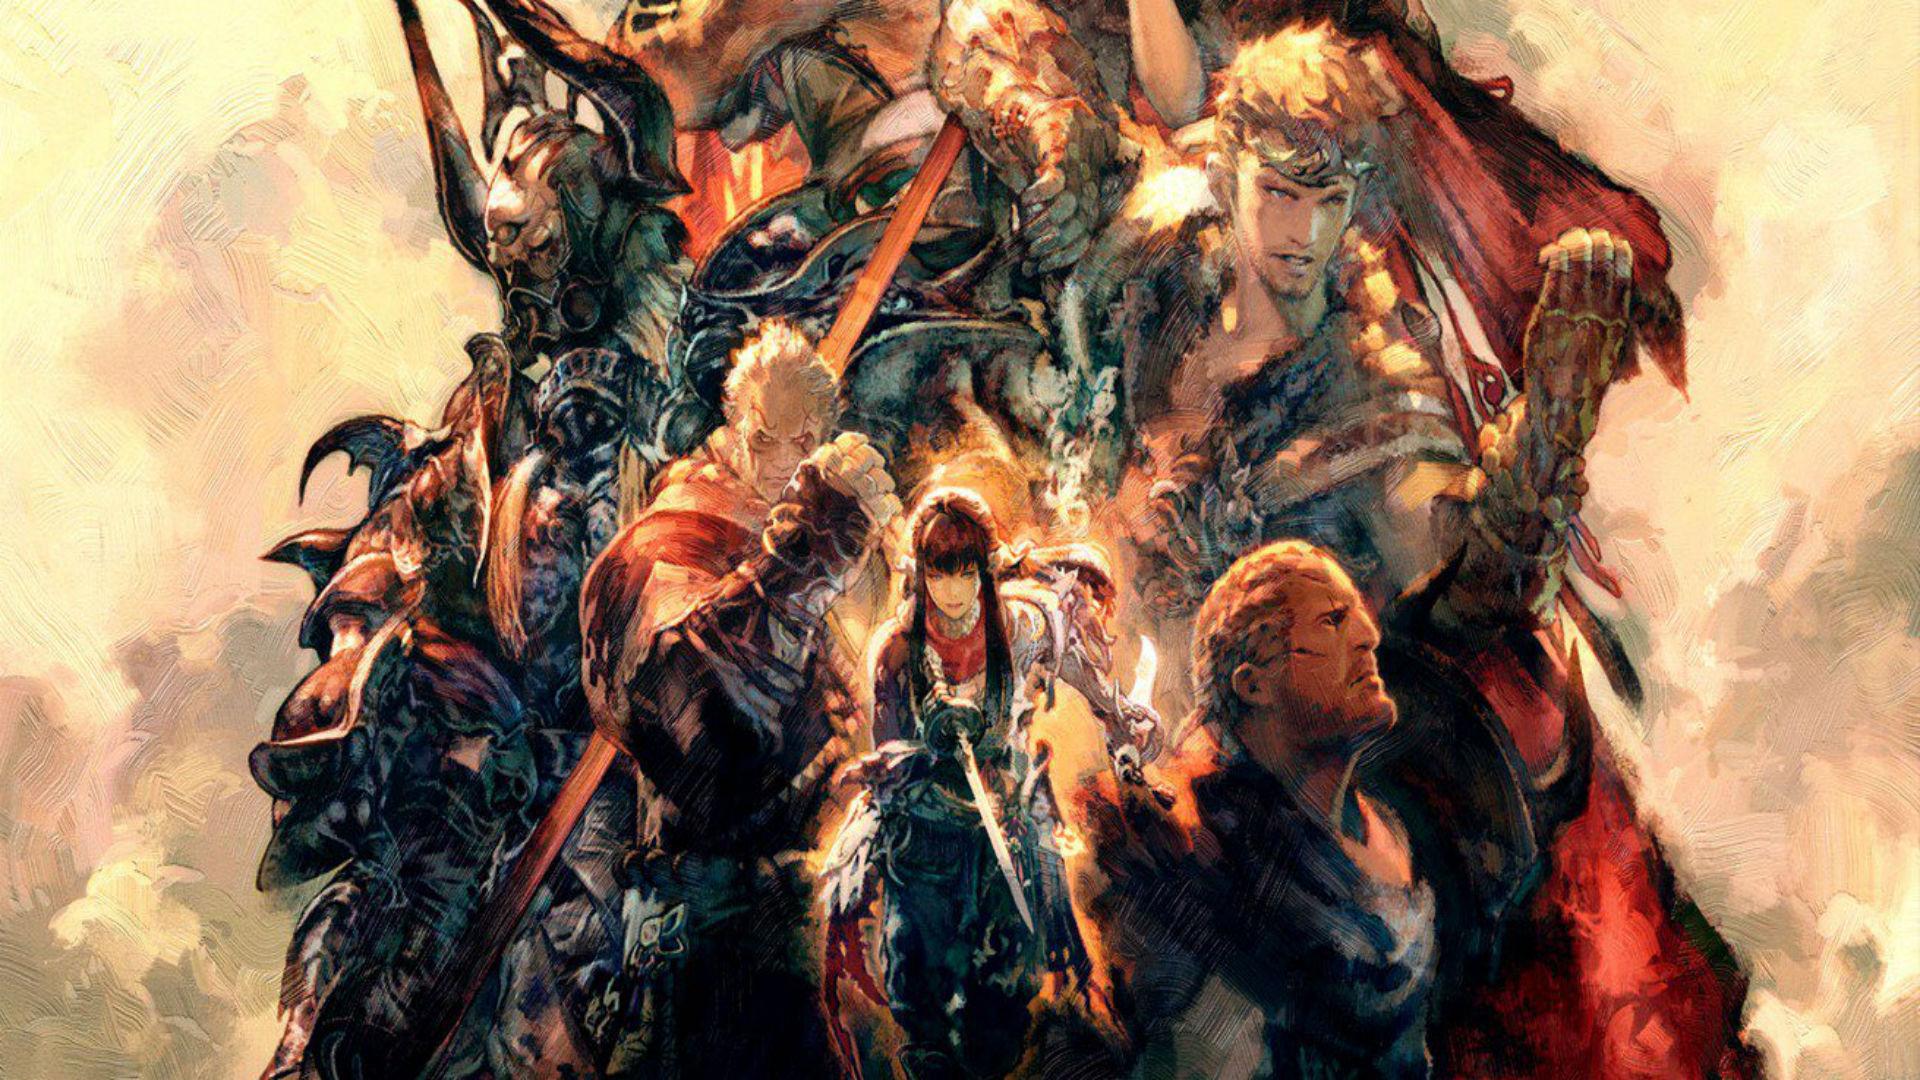 Final Fantasy XIV: Stormblood's Opening Movie Reveals New